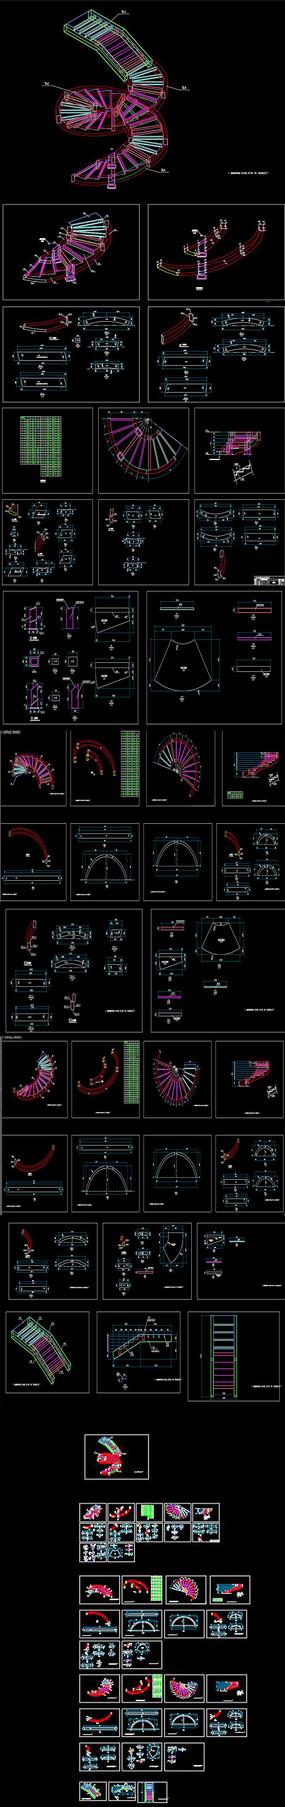 螺旋钢楼梯CAD图库